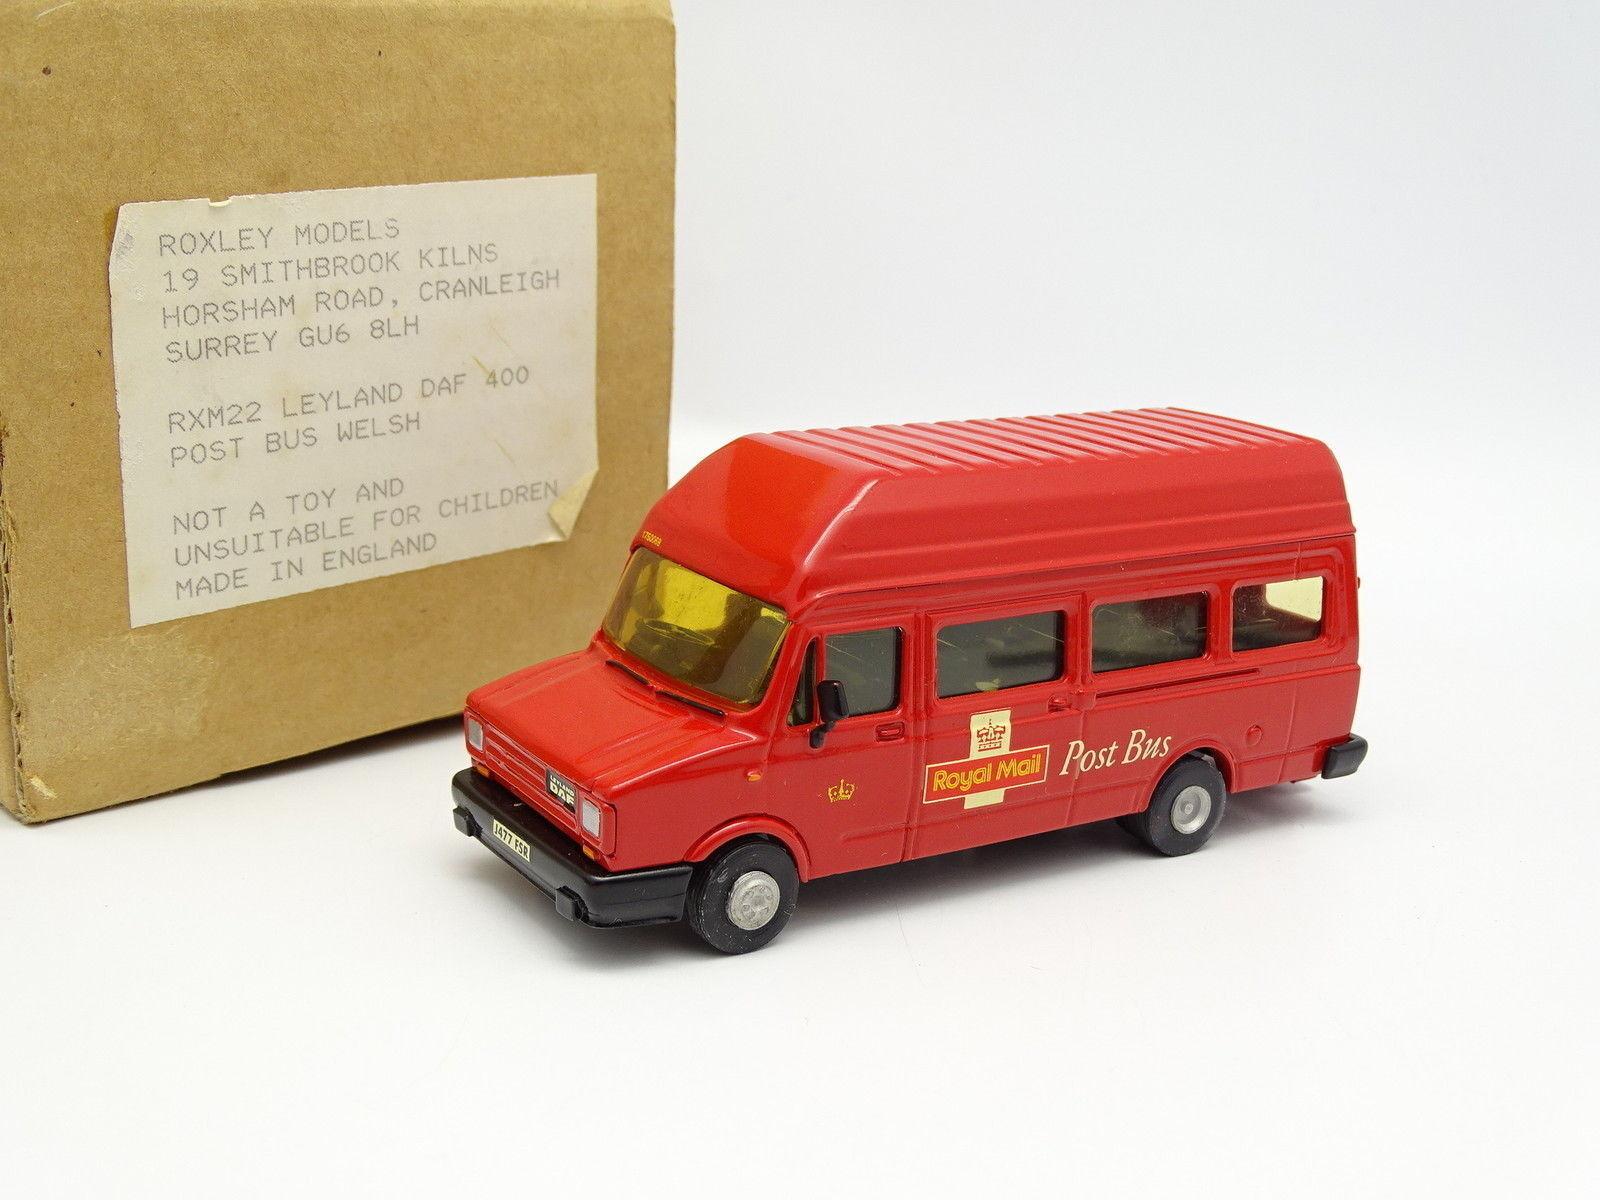 Roxley Models 1 48 - Leyland Daf 400 Post Bus Royal Mail